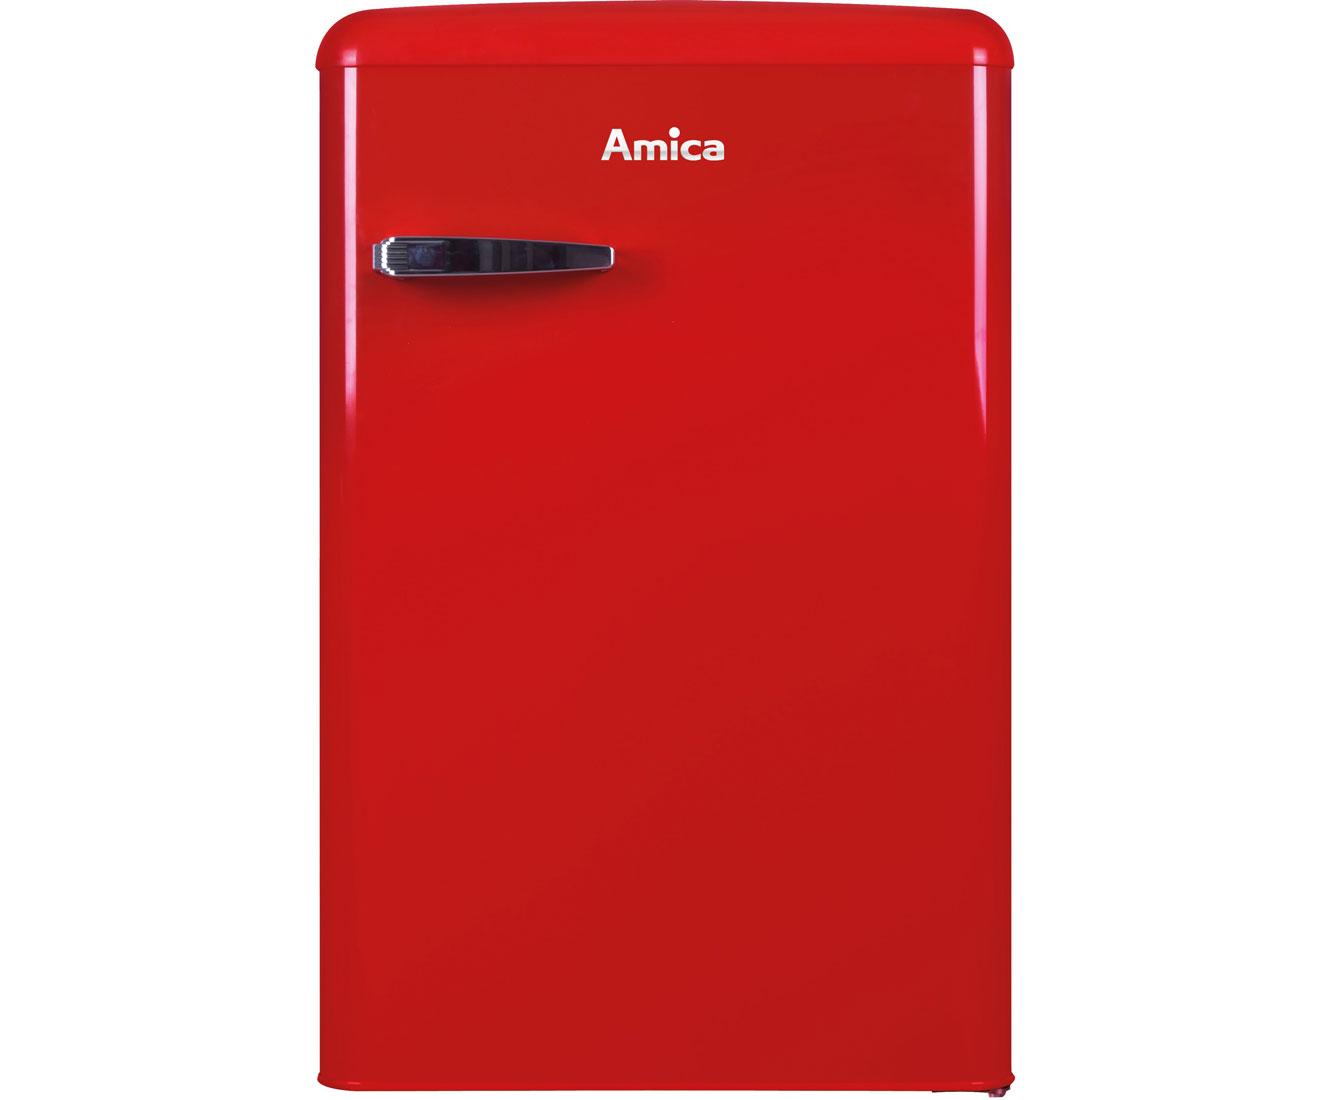 Retro Kühlschrank 85 Cm : Amica vks r kühlschrank rot retro design a